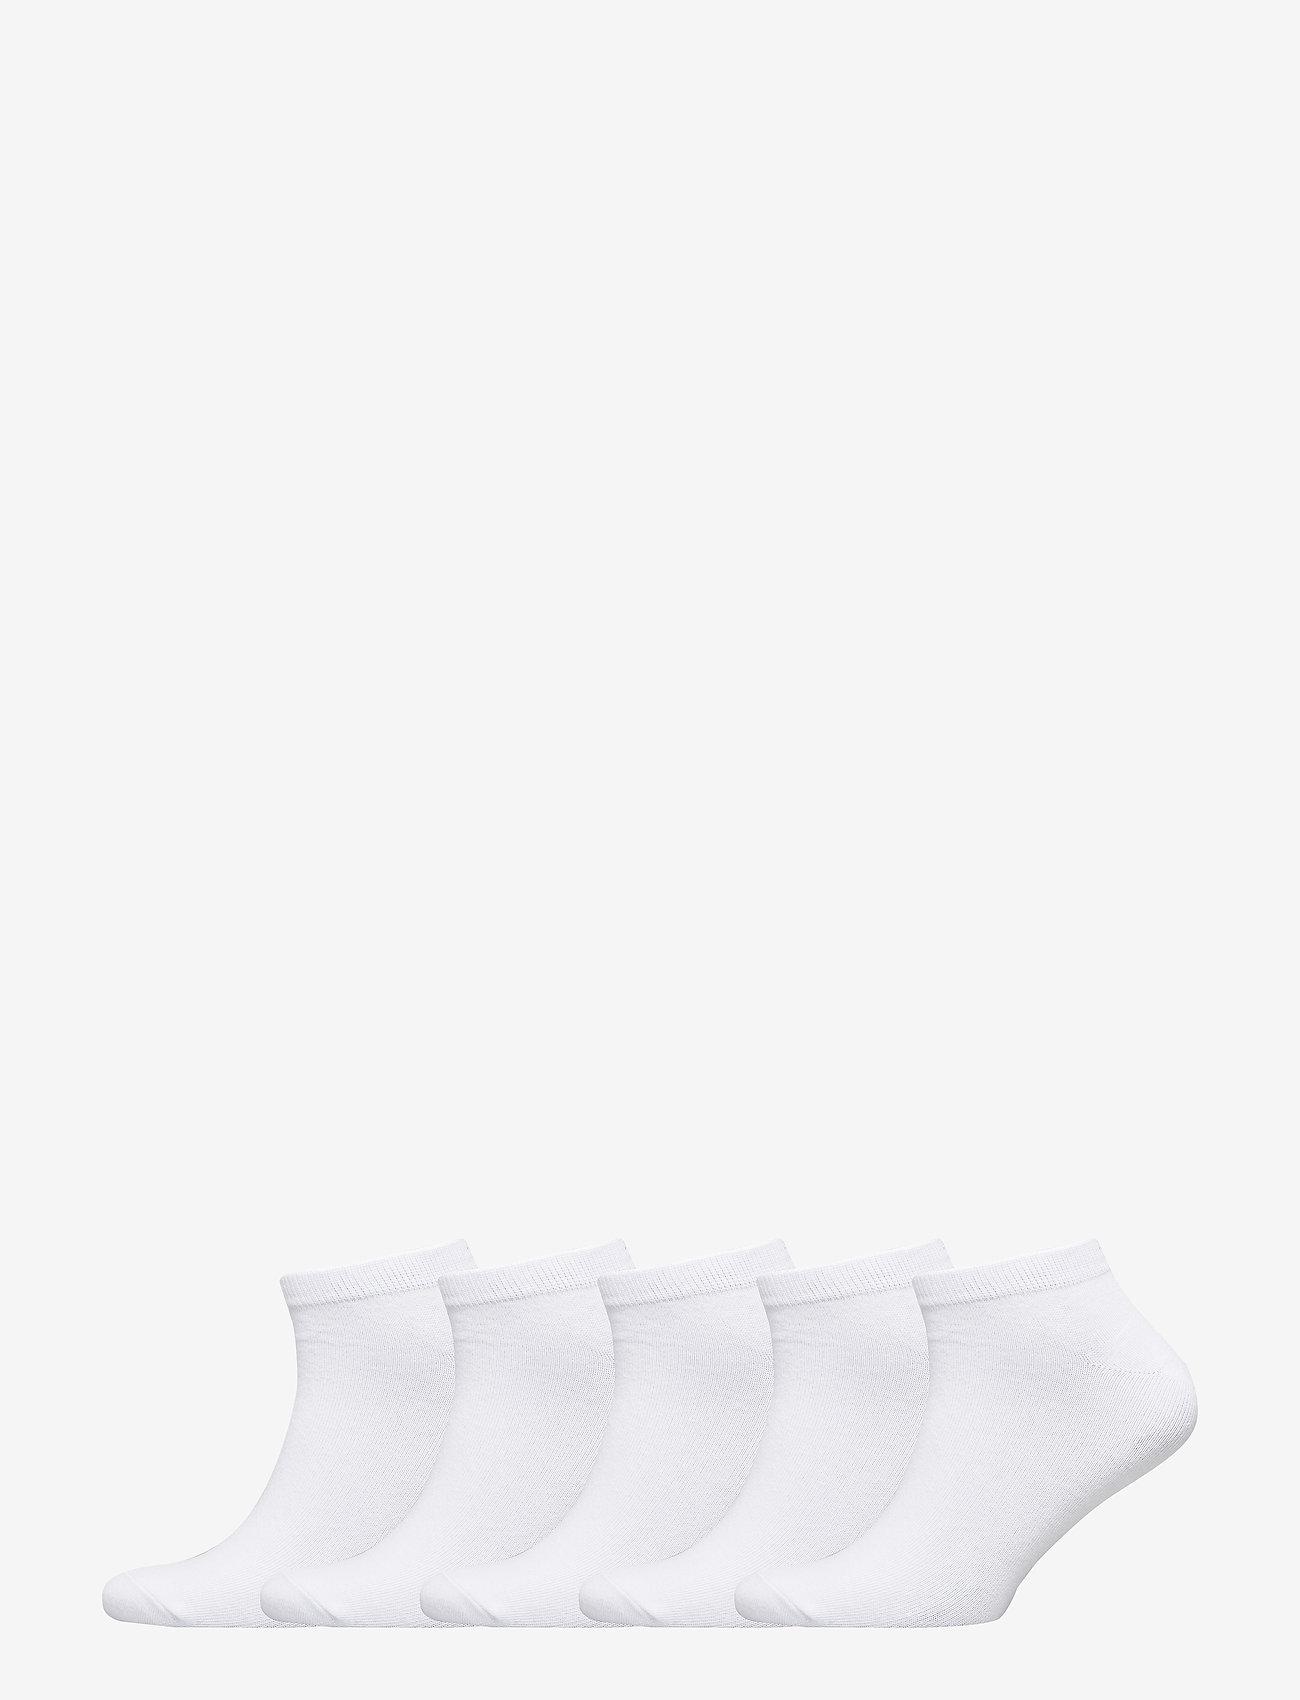 Jack & Jones - JACDONGO SOCKS 5 PACK NOOS - skarpety za kostkę - white - 0